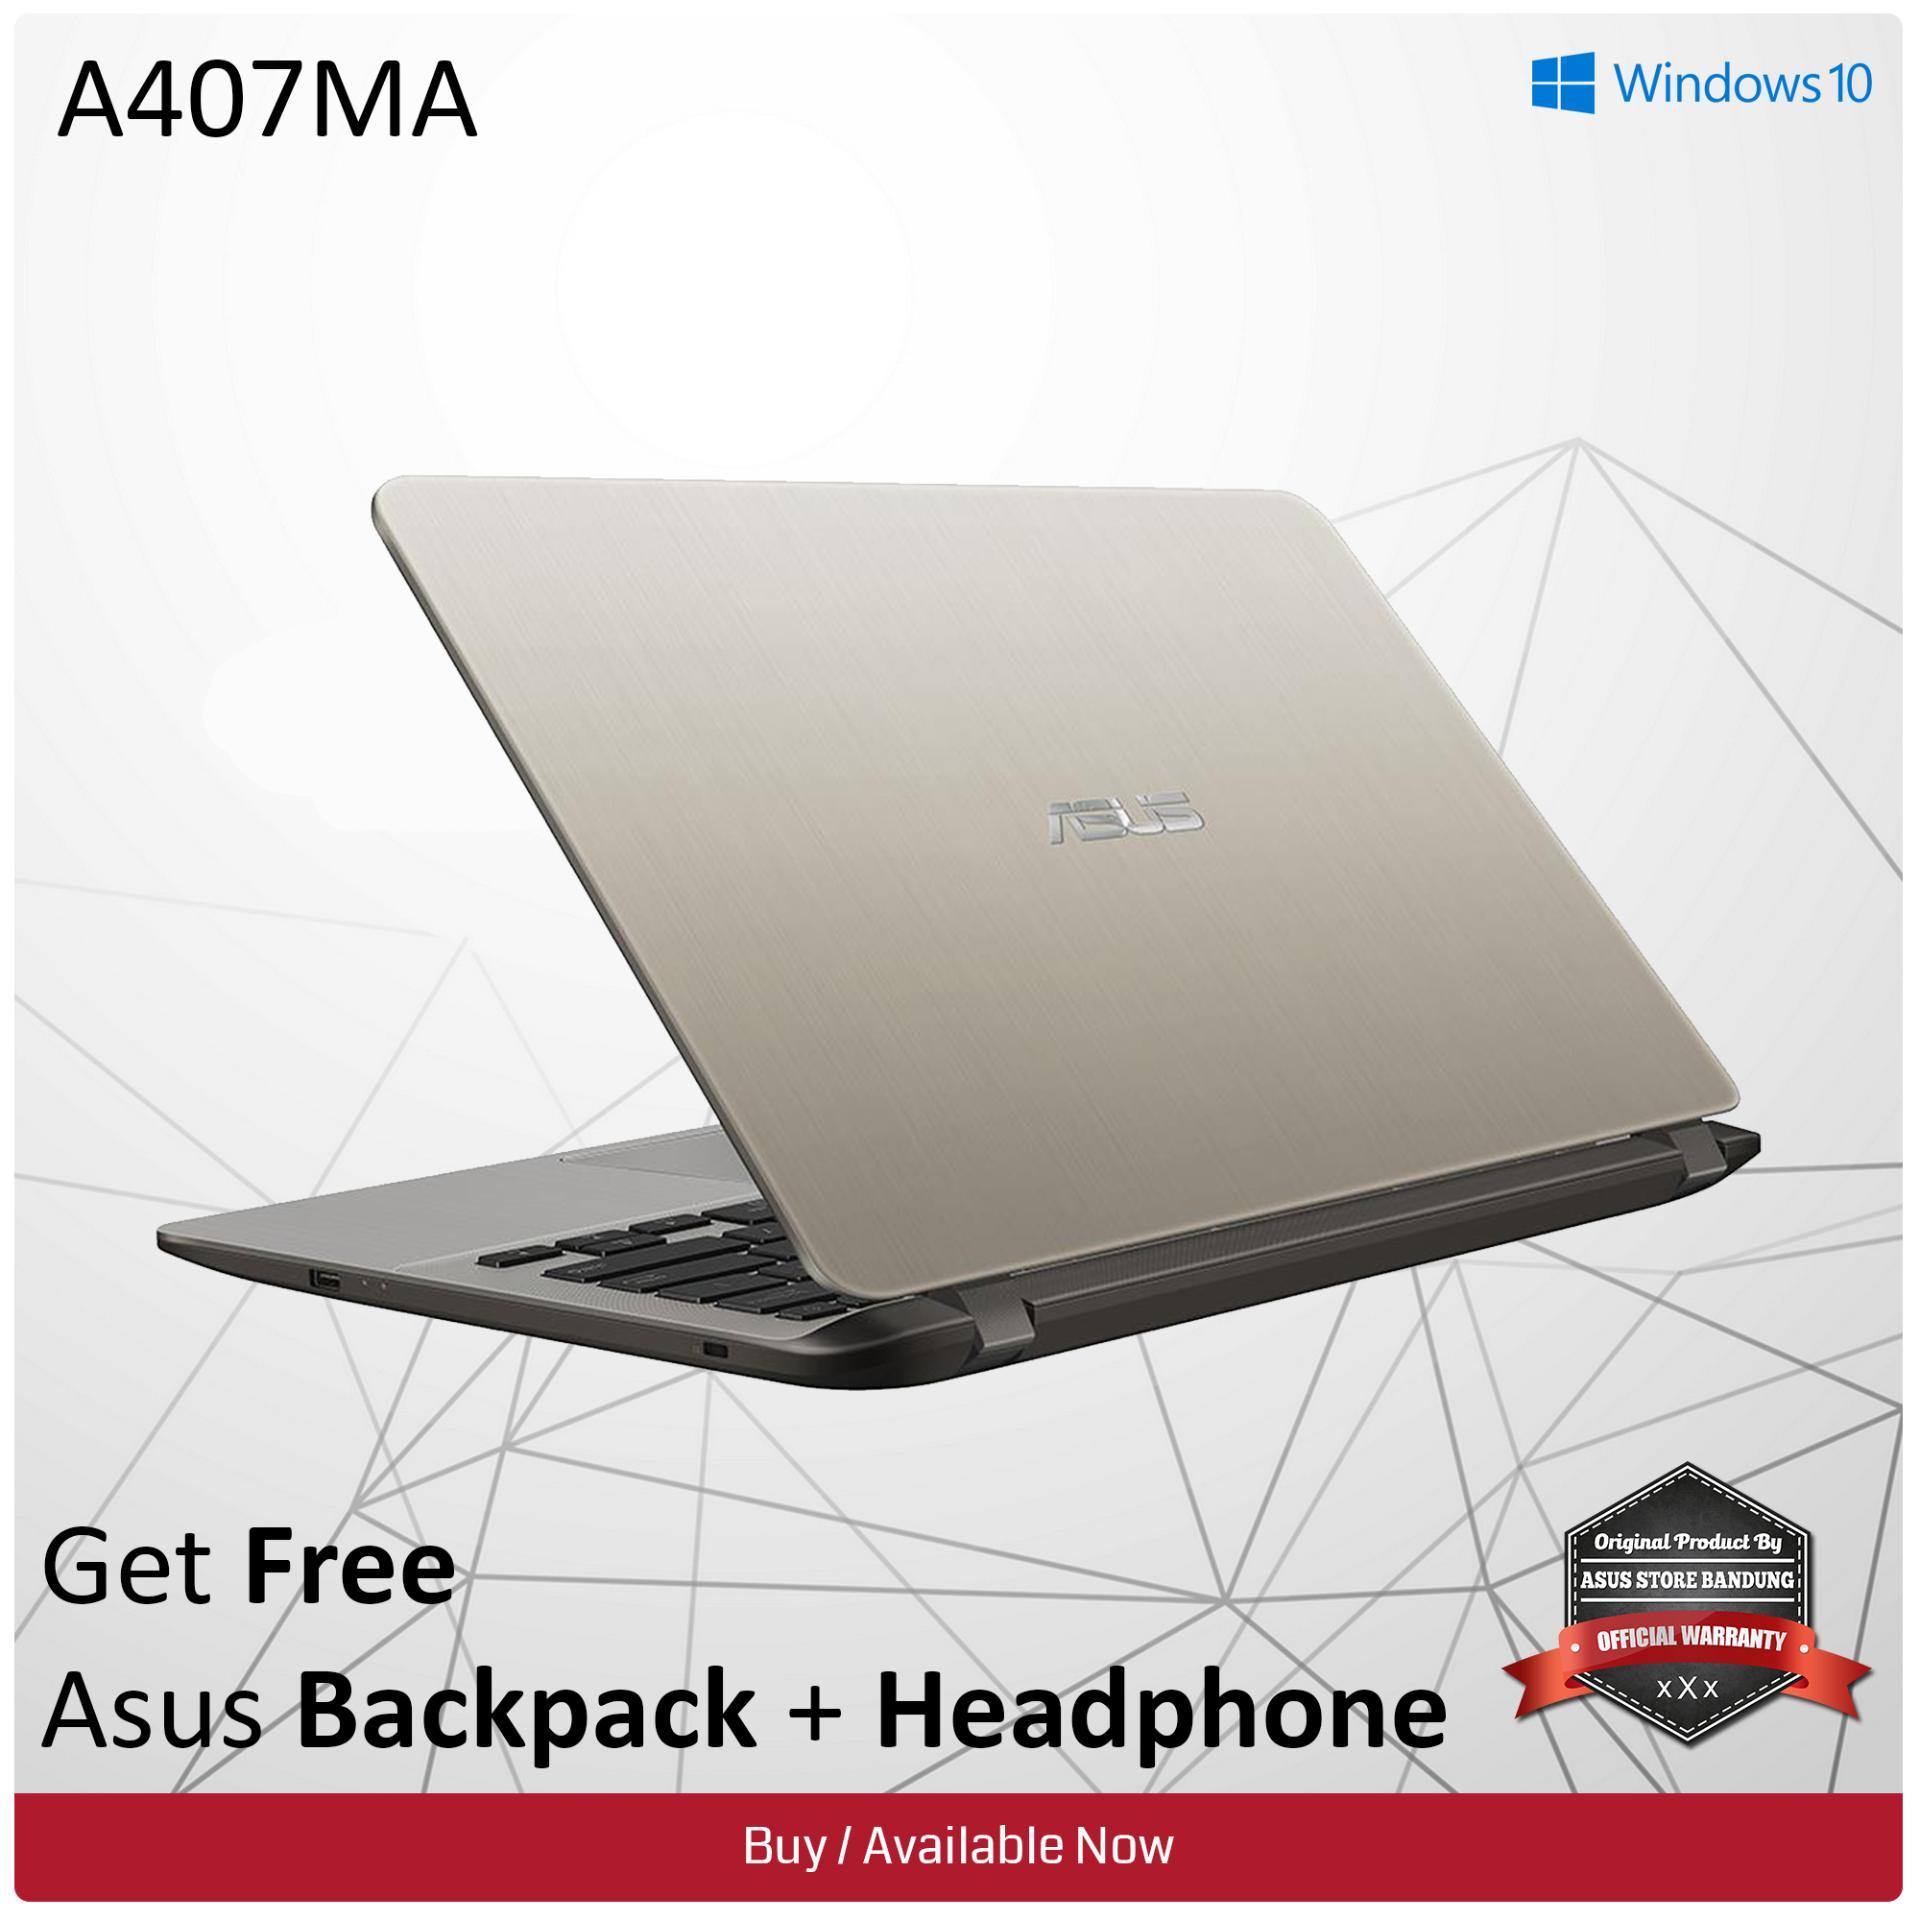 Asus A407MA-BV002T [90NB0HR2-M00520] Celeron N4000 Fingerprint 1TB HDD 4GB RAM Win 10 + Headphone + Backpack